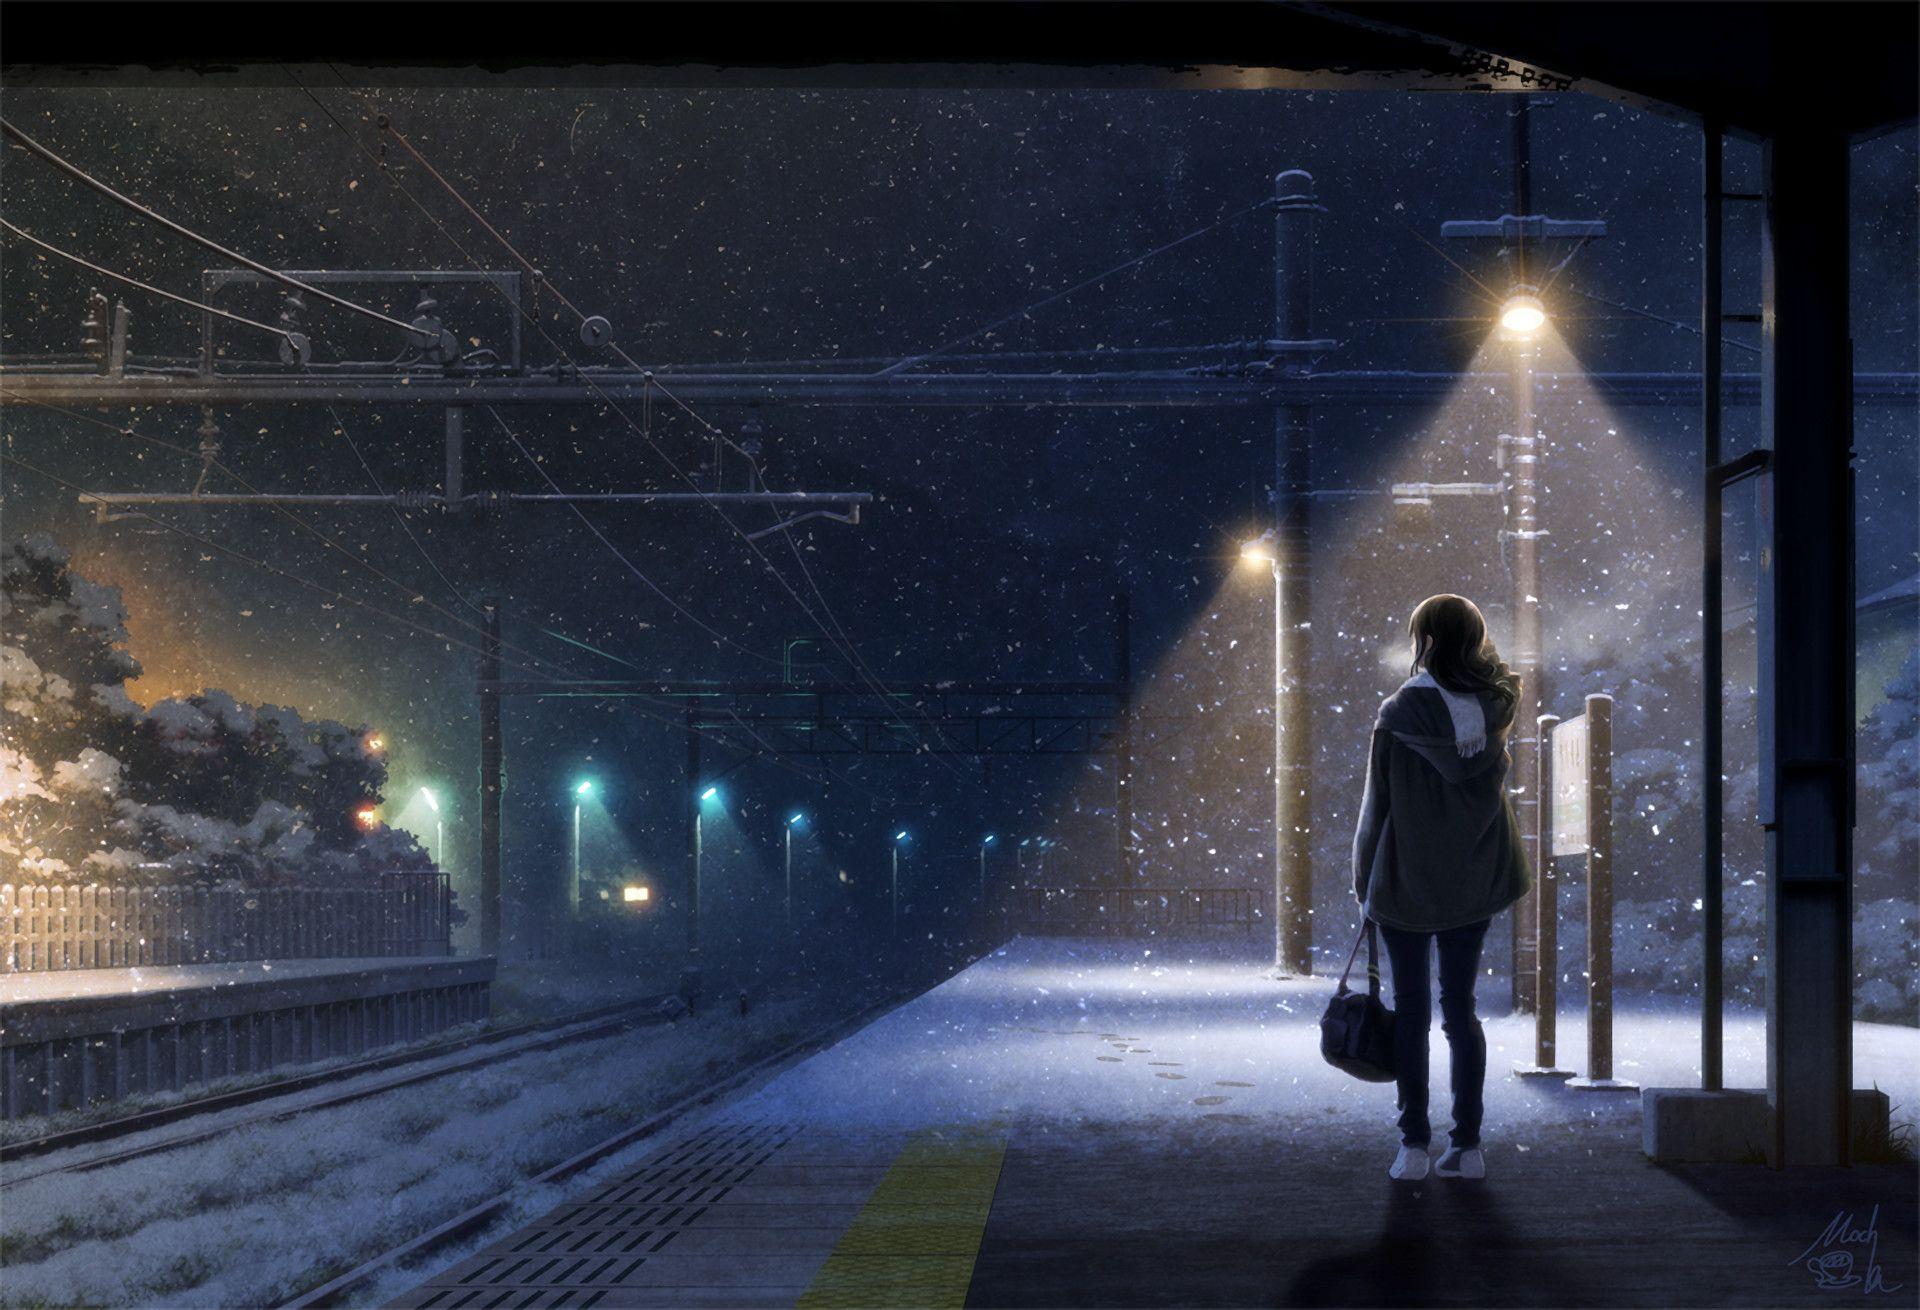 Anime Original Echarpe Madchen Winter Train Station Neige Original Anime Wallpaper 1920x1310 Anime Scenery Anime Background Scenery Hd wallpaper night snow city train